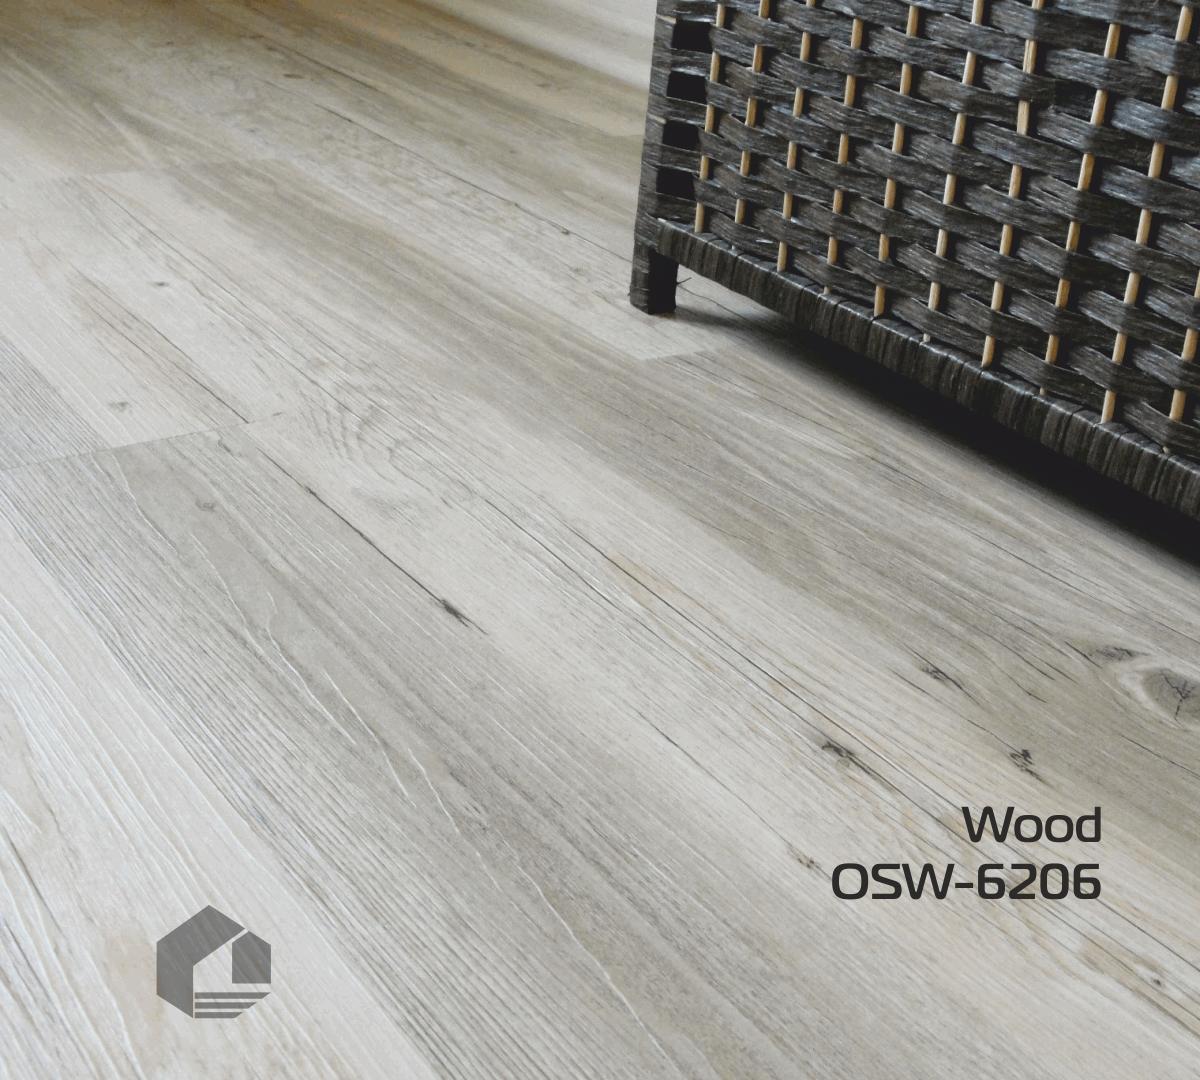 Кварцвиниловая плитка Orchid Tile Wood OSW-6206 (186*940*3 мм.)